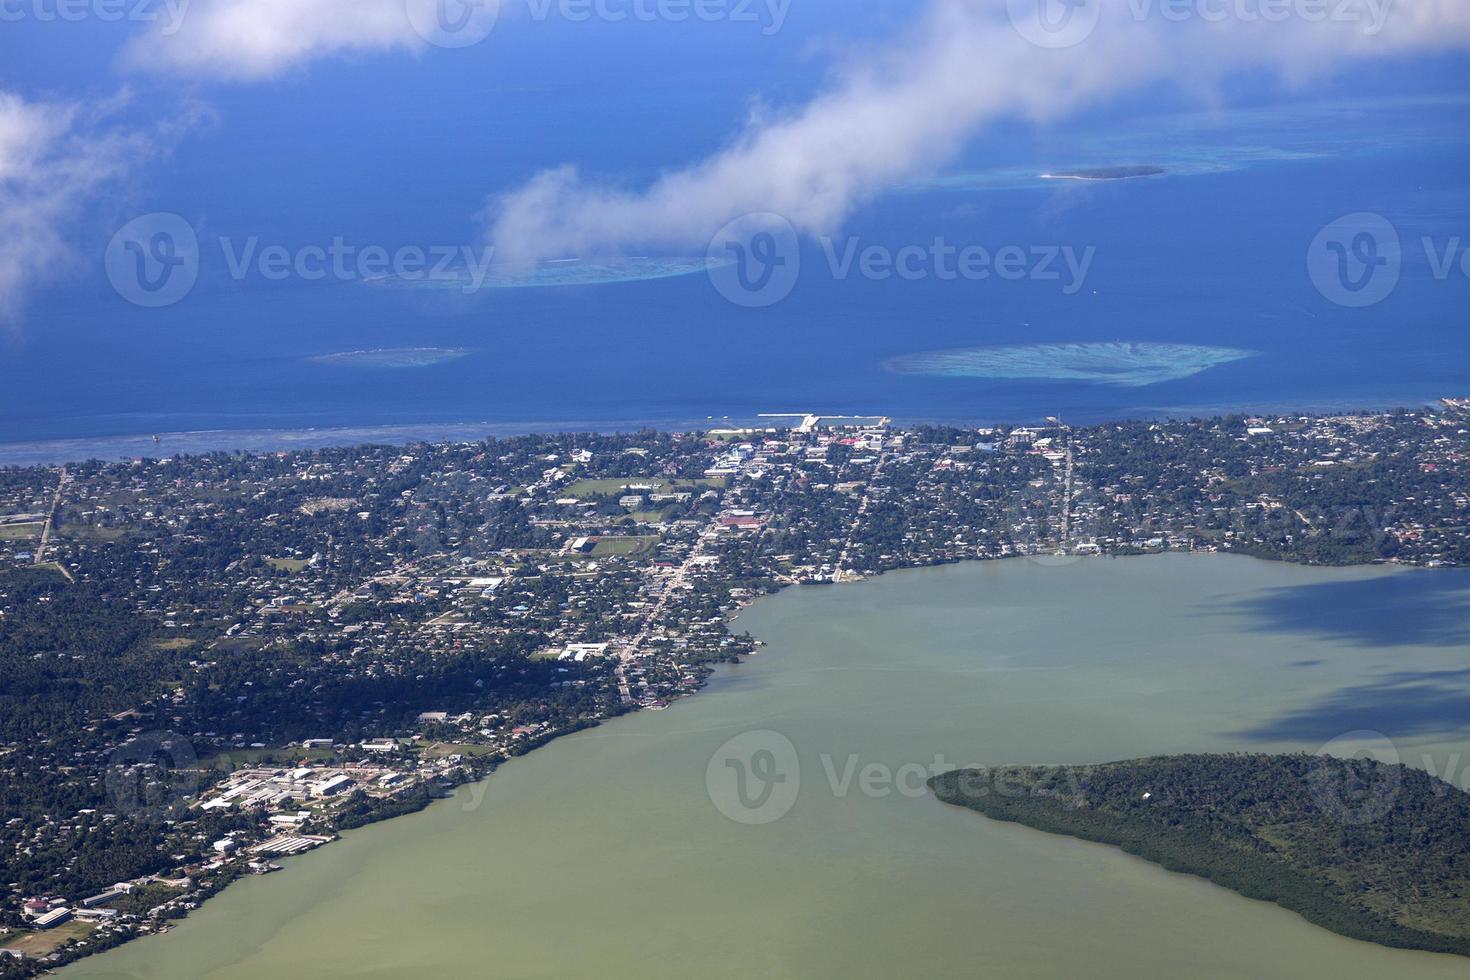 fotografia aerea di nuku'alofa con oceano in lontananza foto